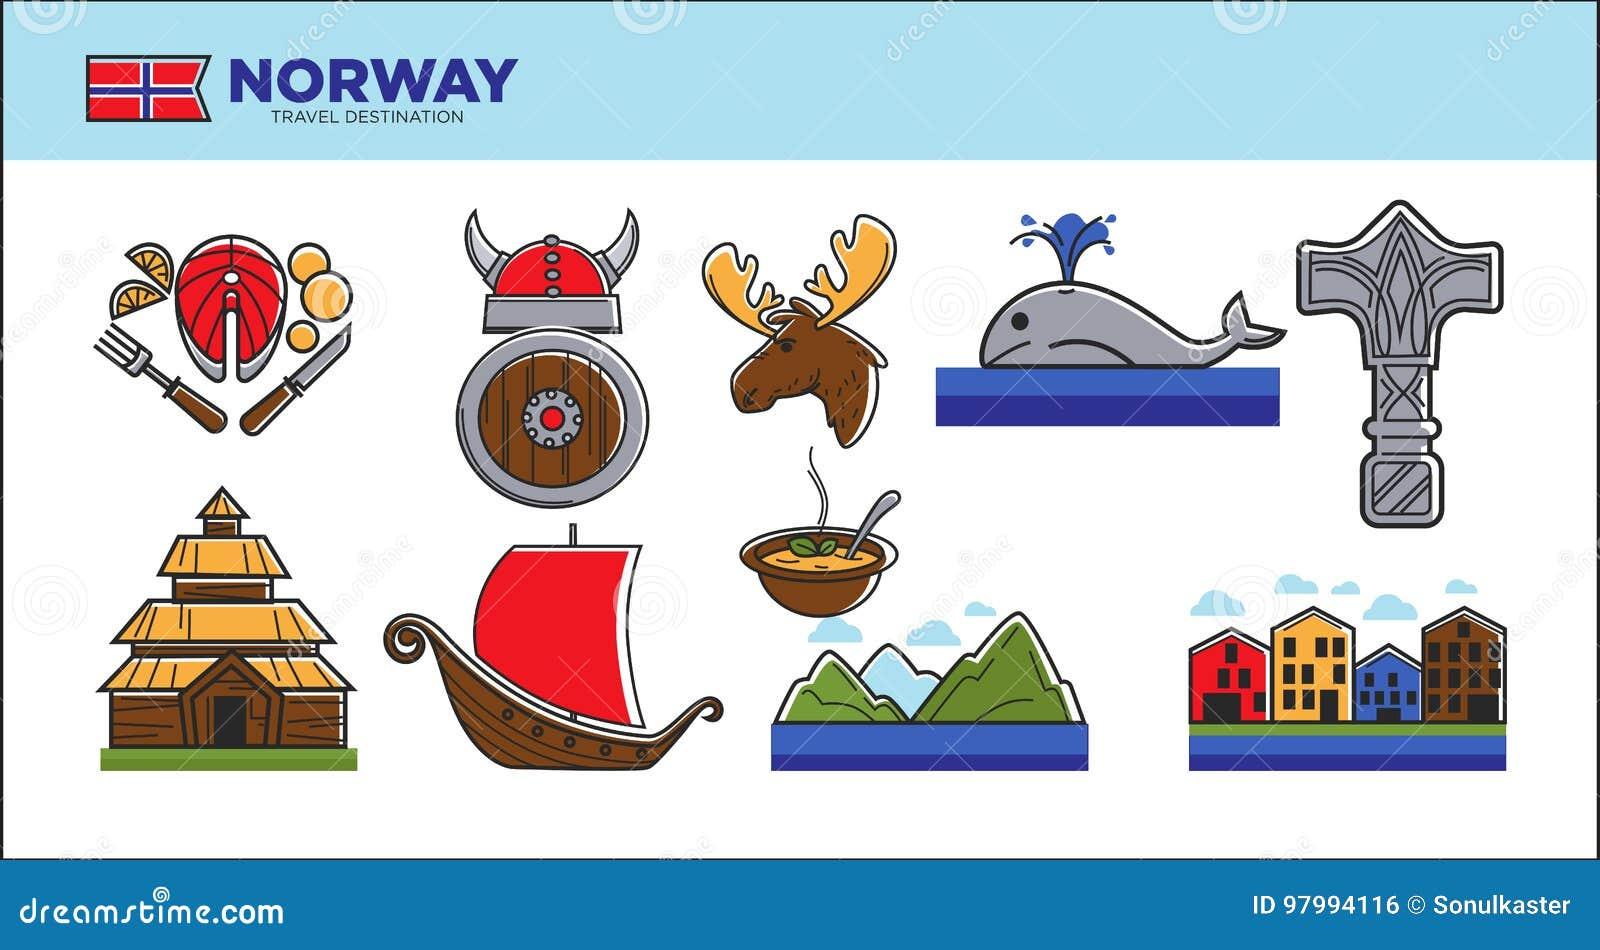 Norway Travel Landmark Symbols Or Norwegian Tourist Famous